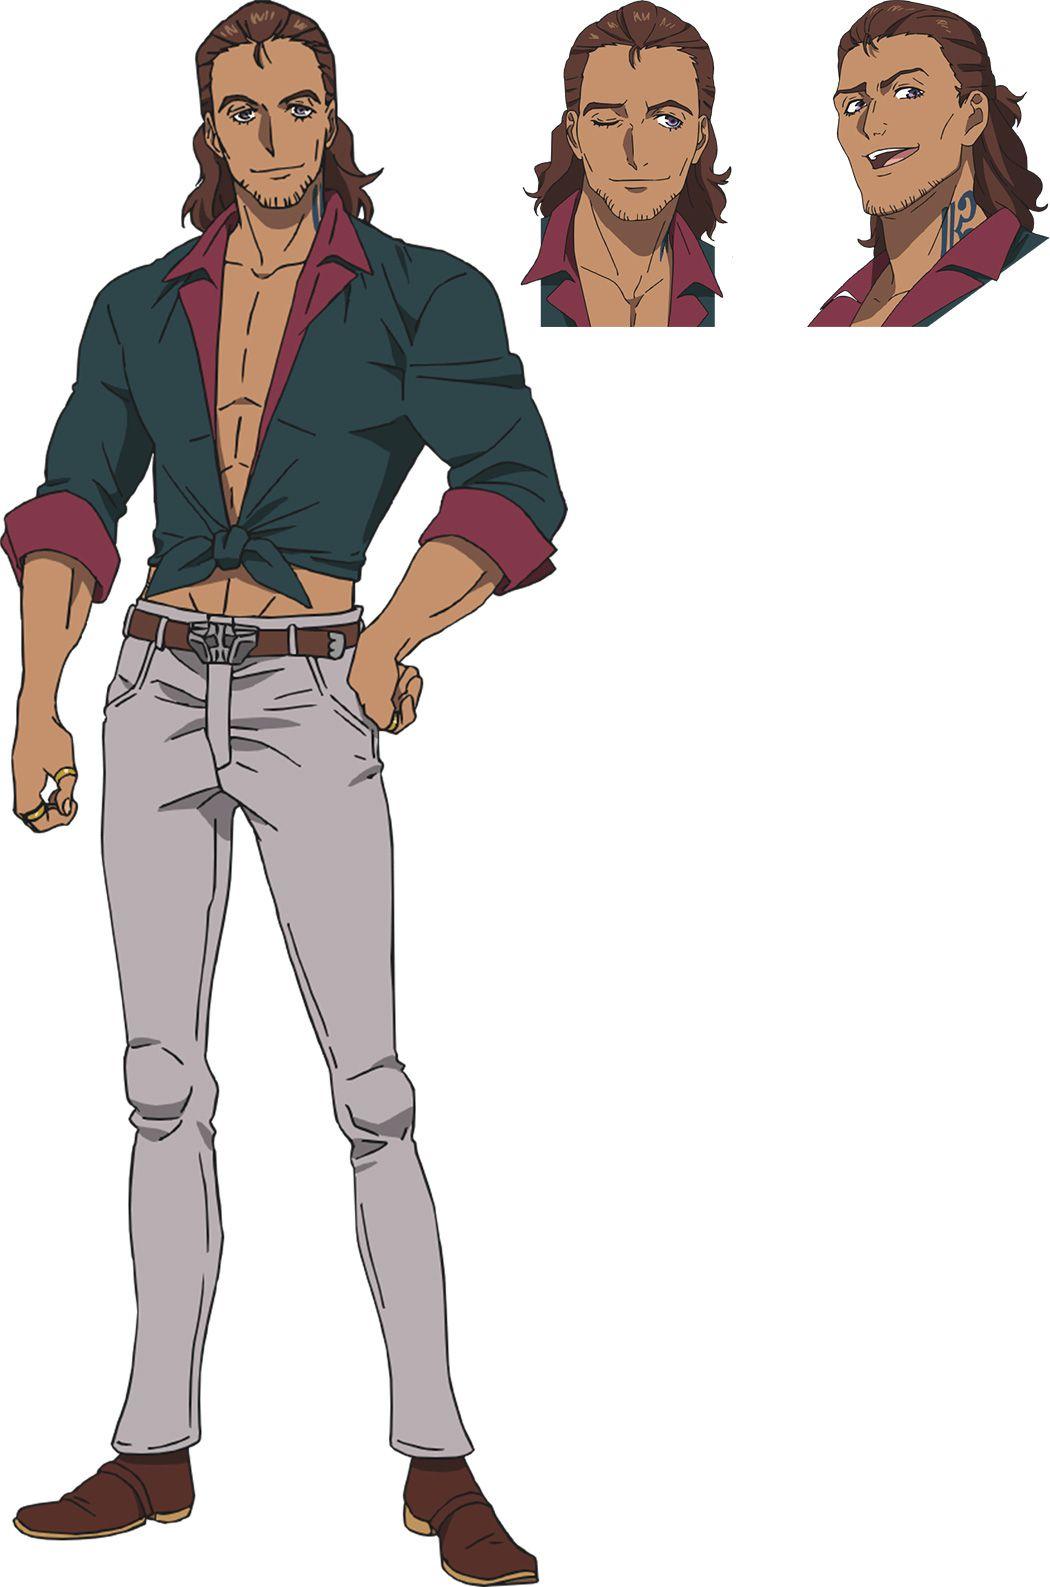 takt-op.Destiny-Character-Designs-Lenny